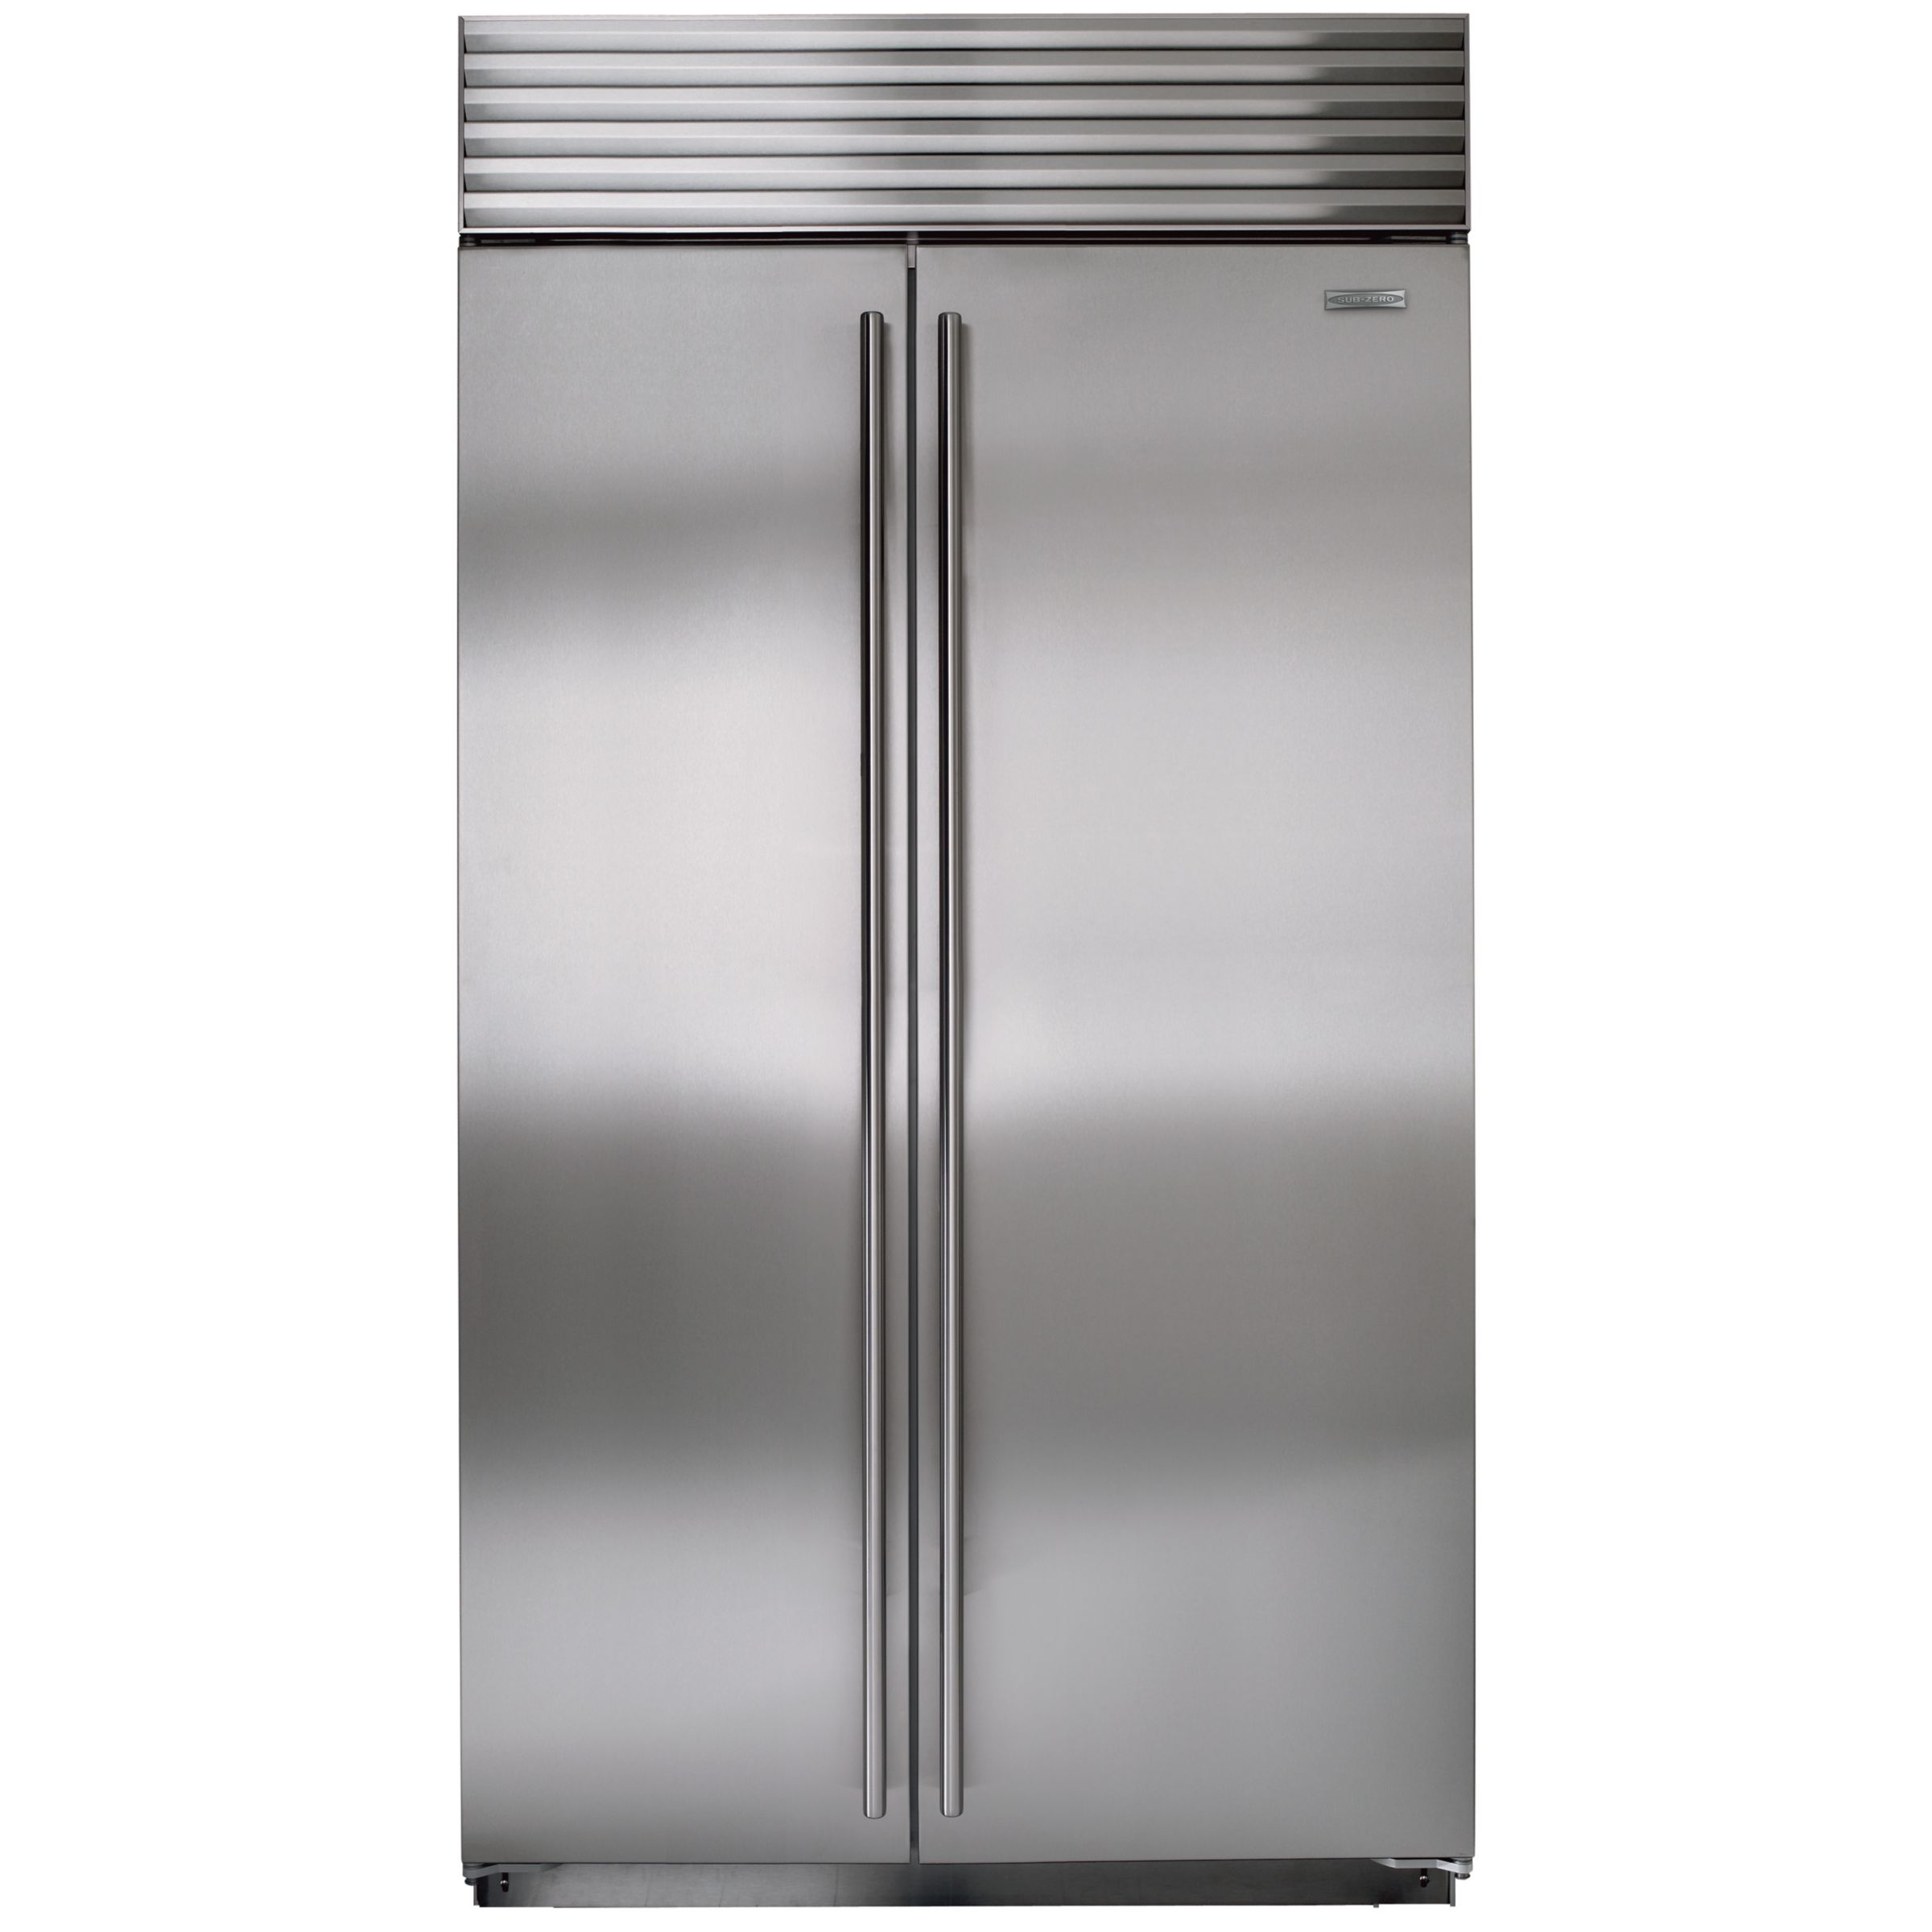 Sub-Zero Sub-Zero ICBBI42S/S/TH Integrated Side by Side Fridge Freezer, Stainless Steel